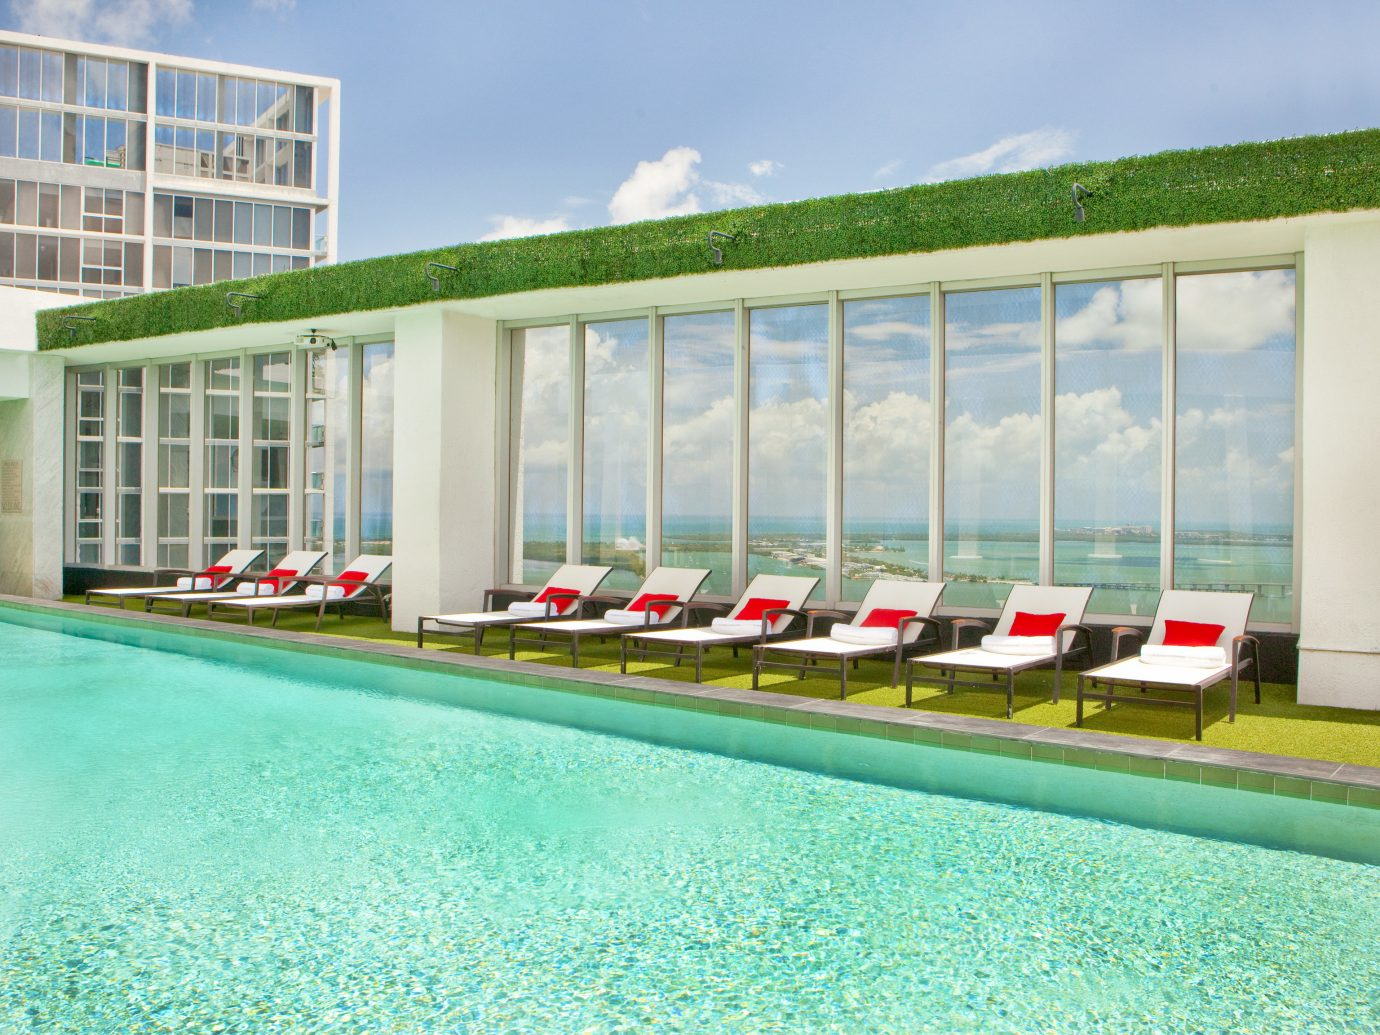 Trip Ideas outdoor leisure swimming pool property building leisure centre condominium estate Resort real estate facade interior design headquarters Villa